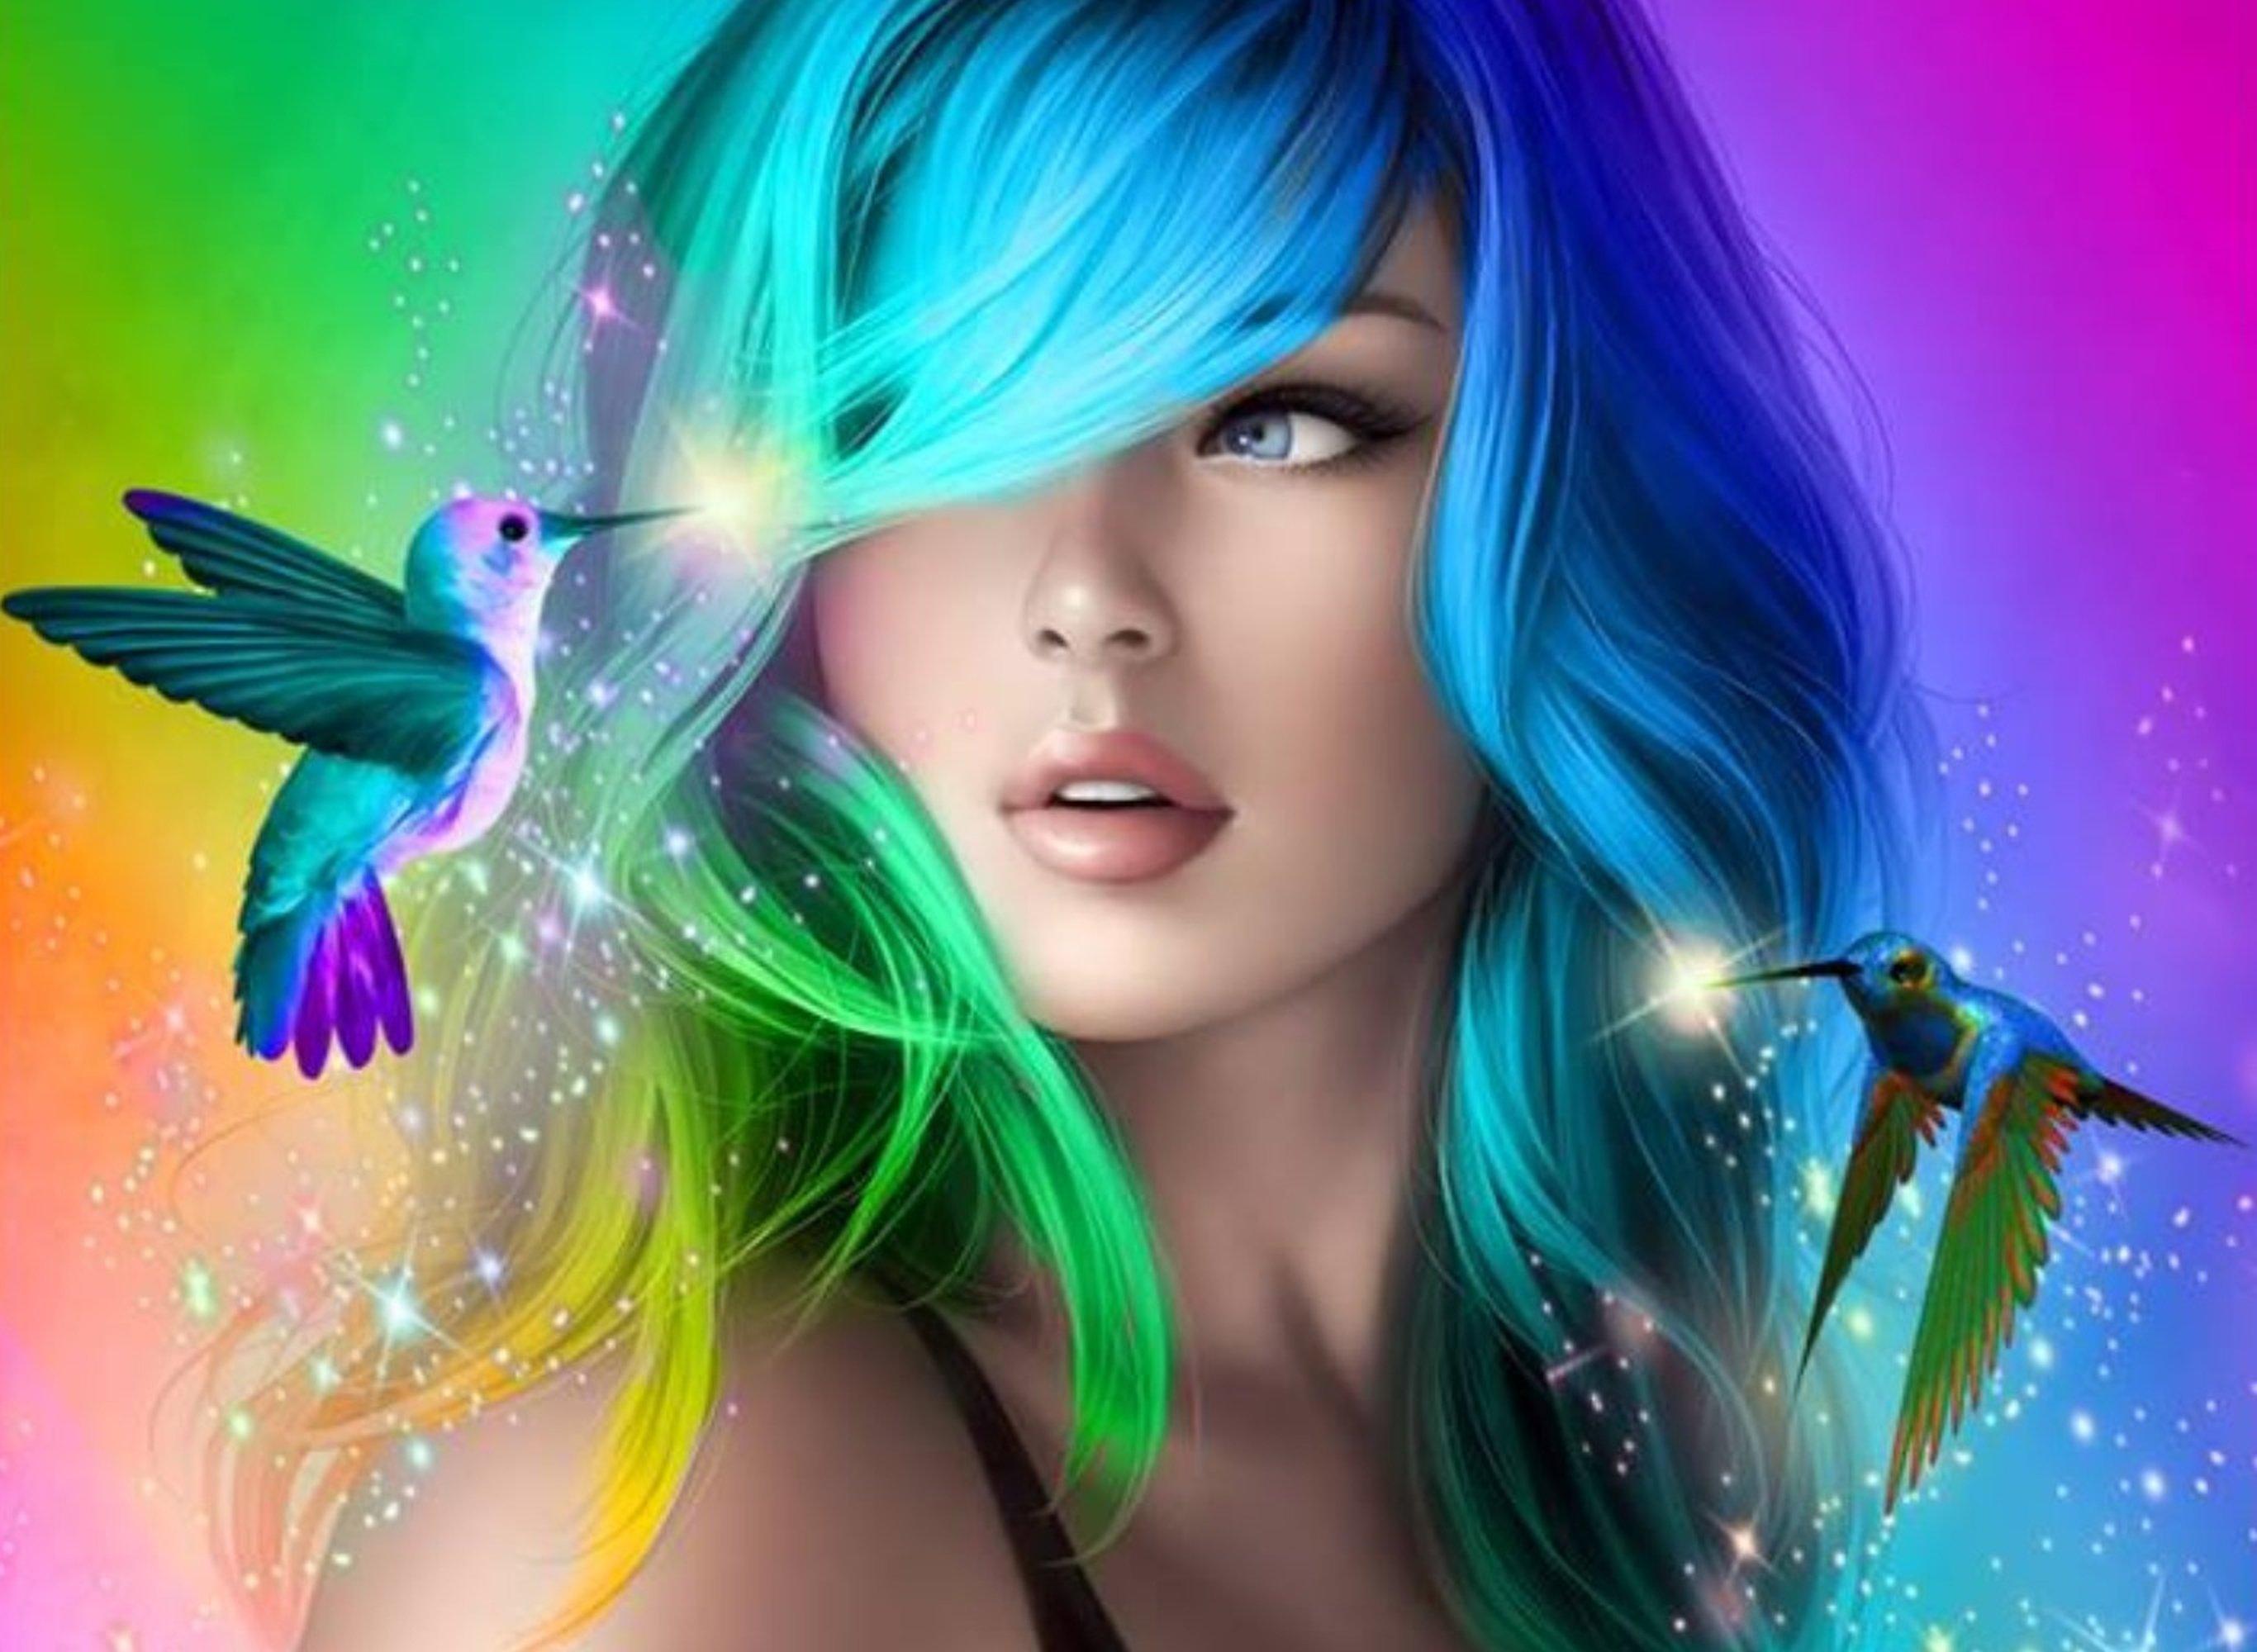 Fantasy Girl Desktop Wallpapers, Fantasy Girl Wallpaper   29 HD